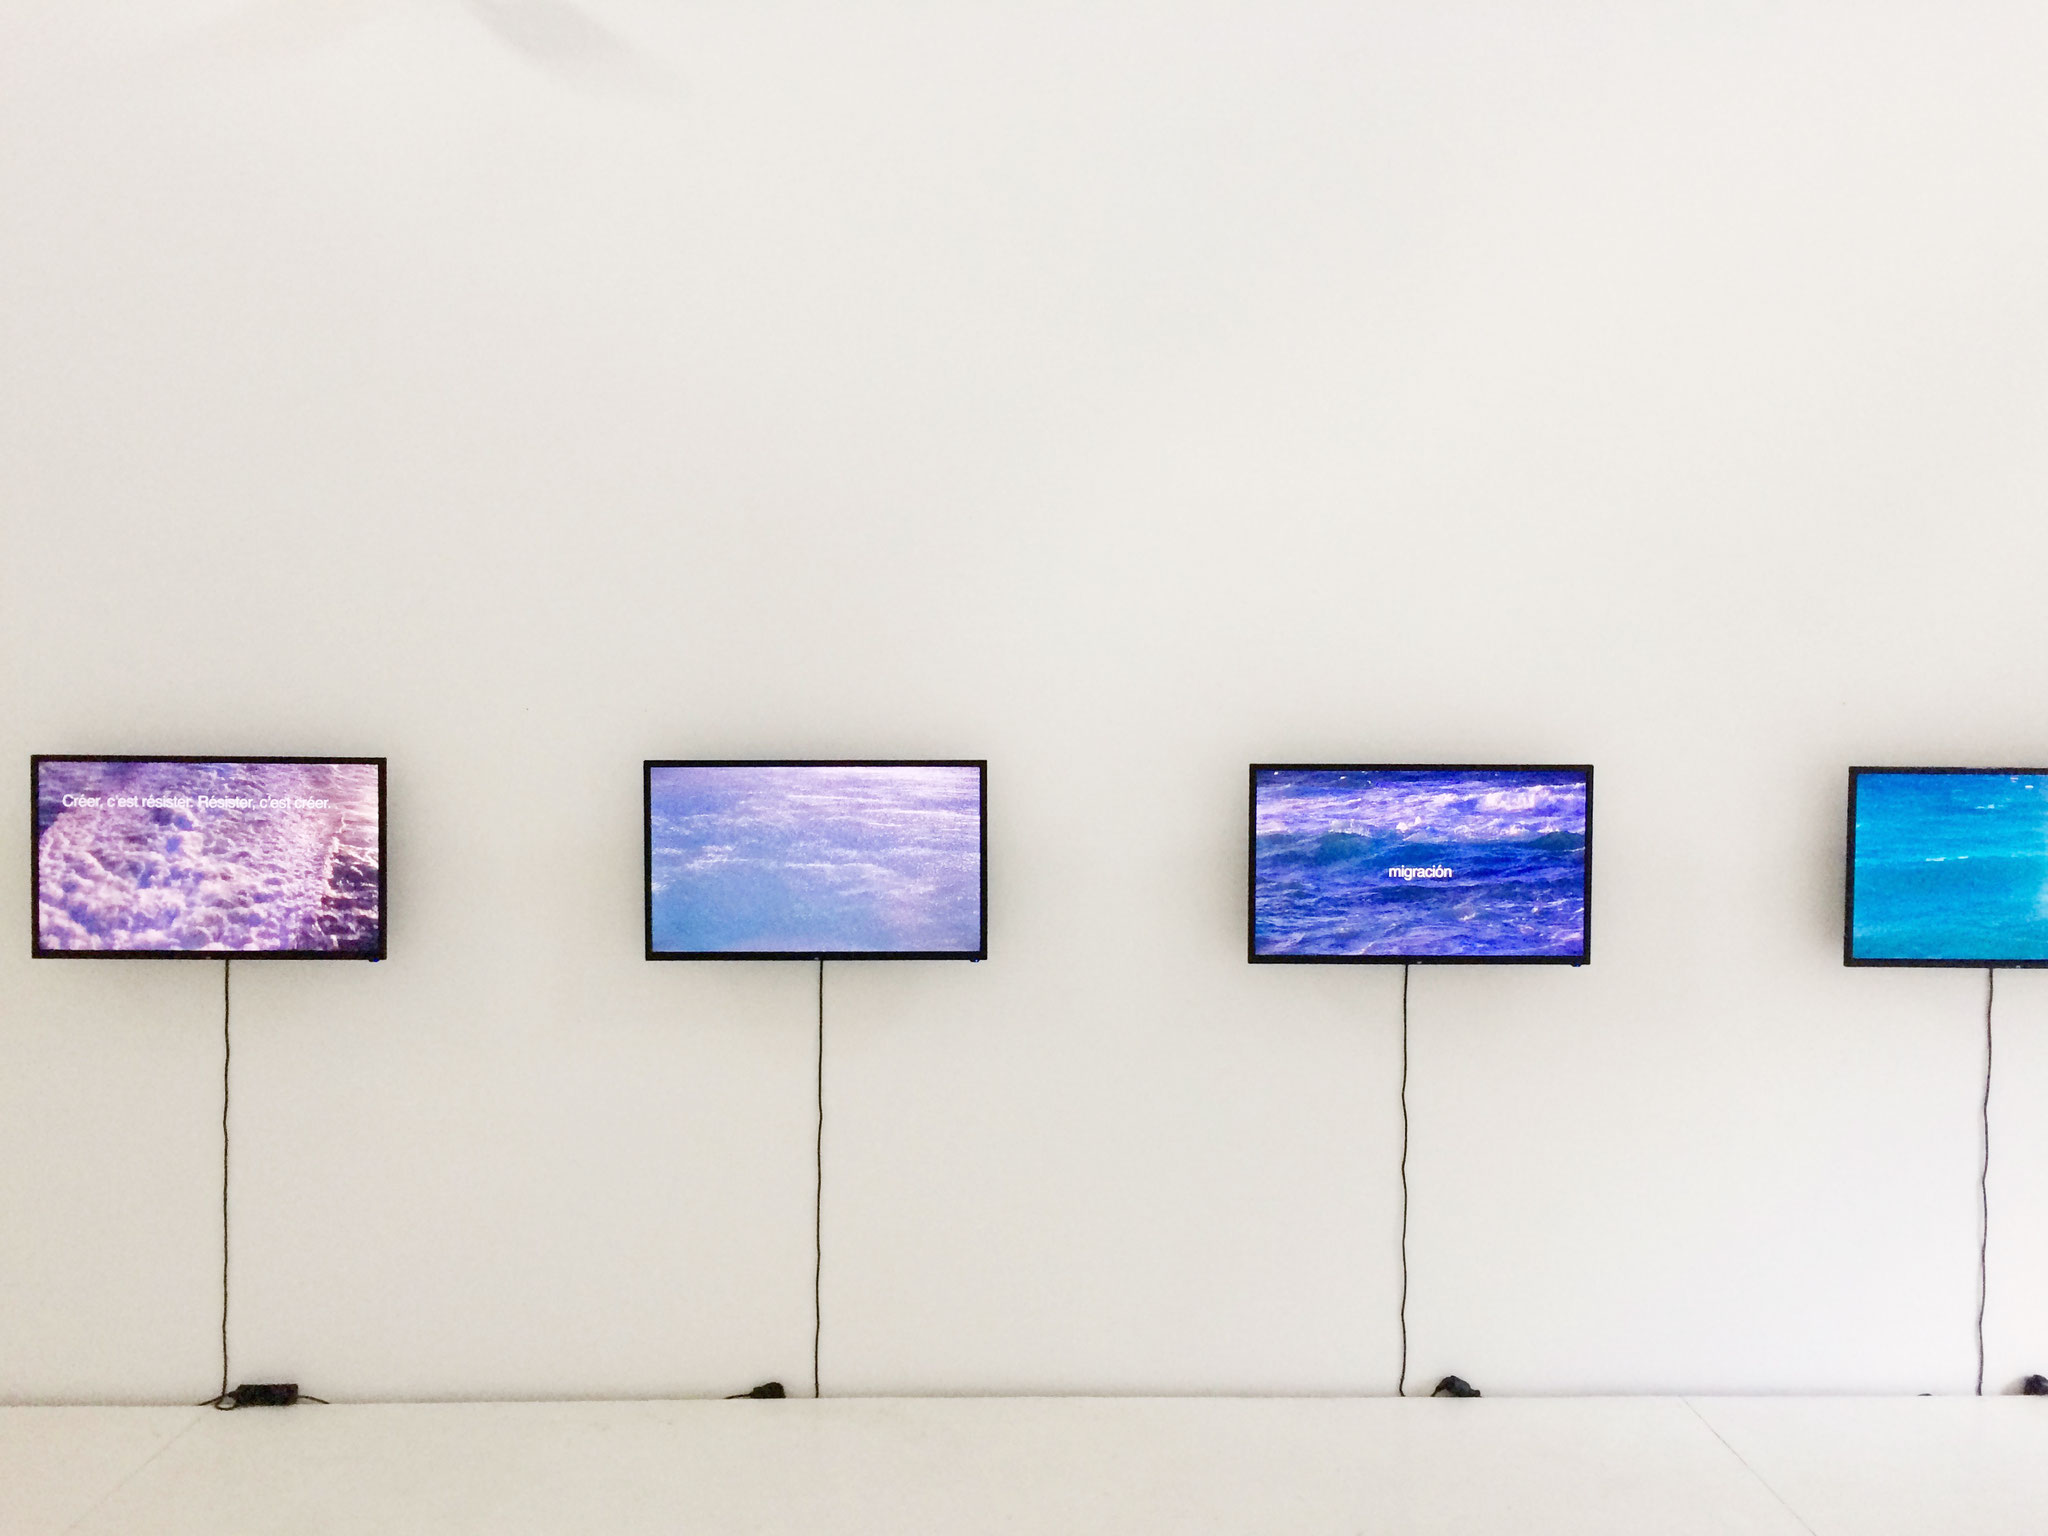 Antoni Muntadas, Aller/Retour, 2013/17, video installation, 6 Led monitors, 700 x 60 cm